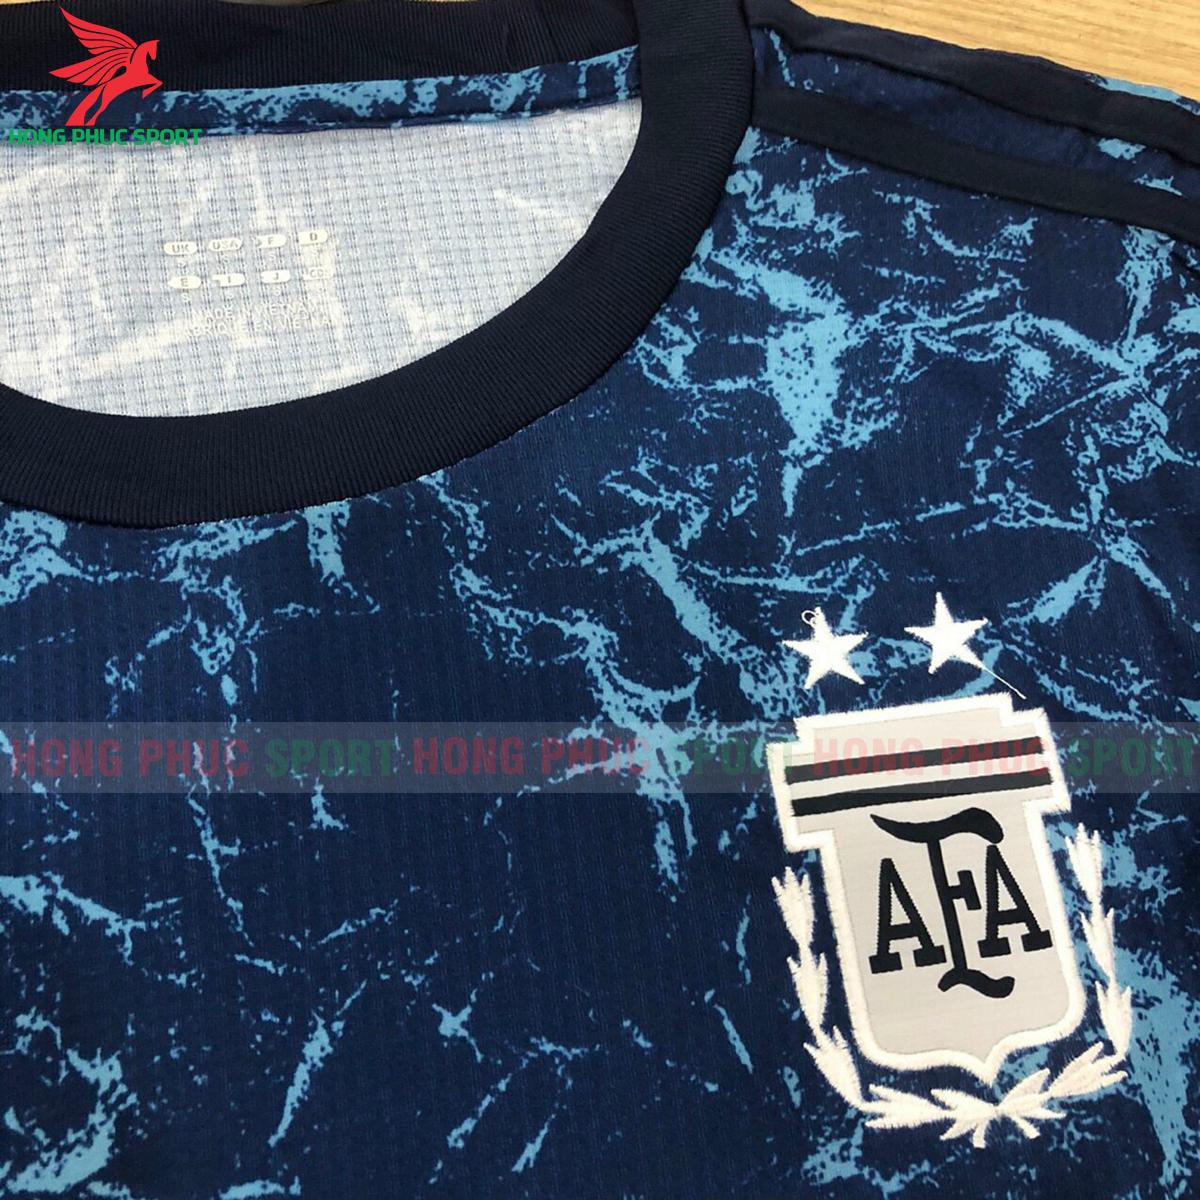 https://cdn.hongphucsport.com/unsafe/s4.shopbay.vn/files/285/ao-bong-da-training-argentina-copa-america-2021-1-60f242d0d318c.png